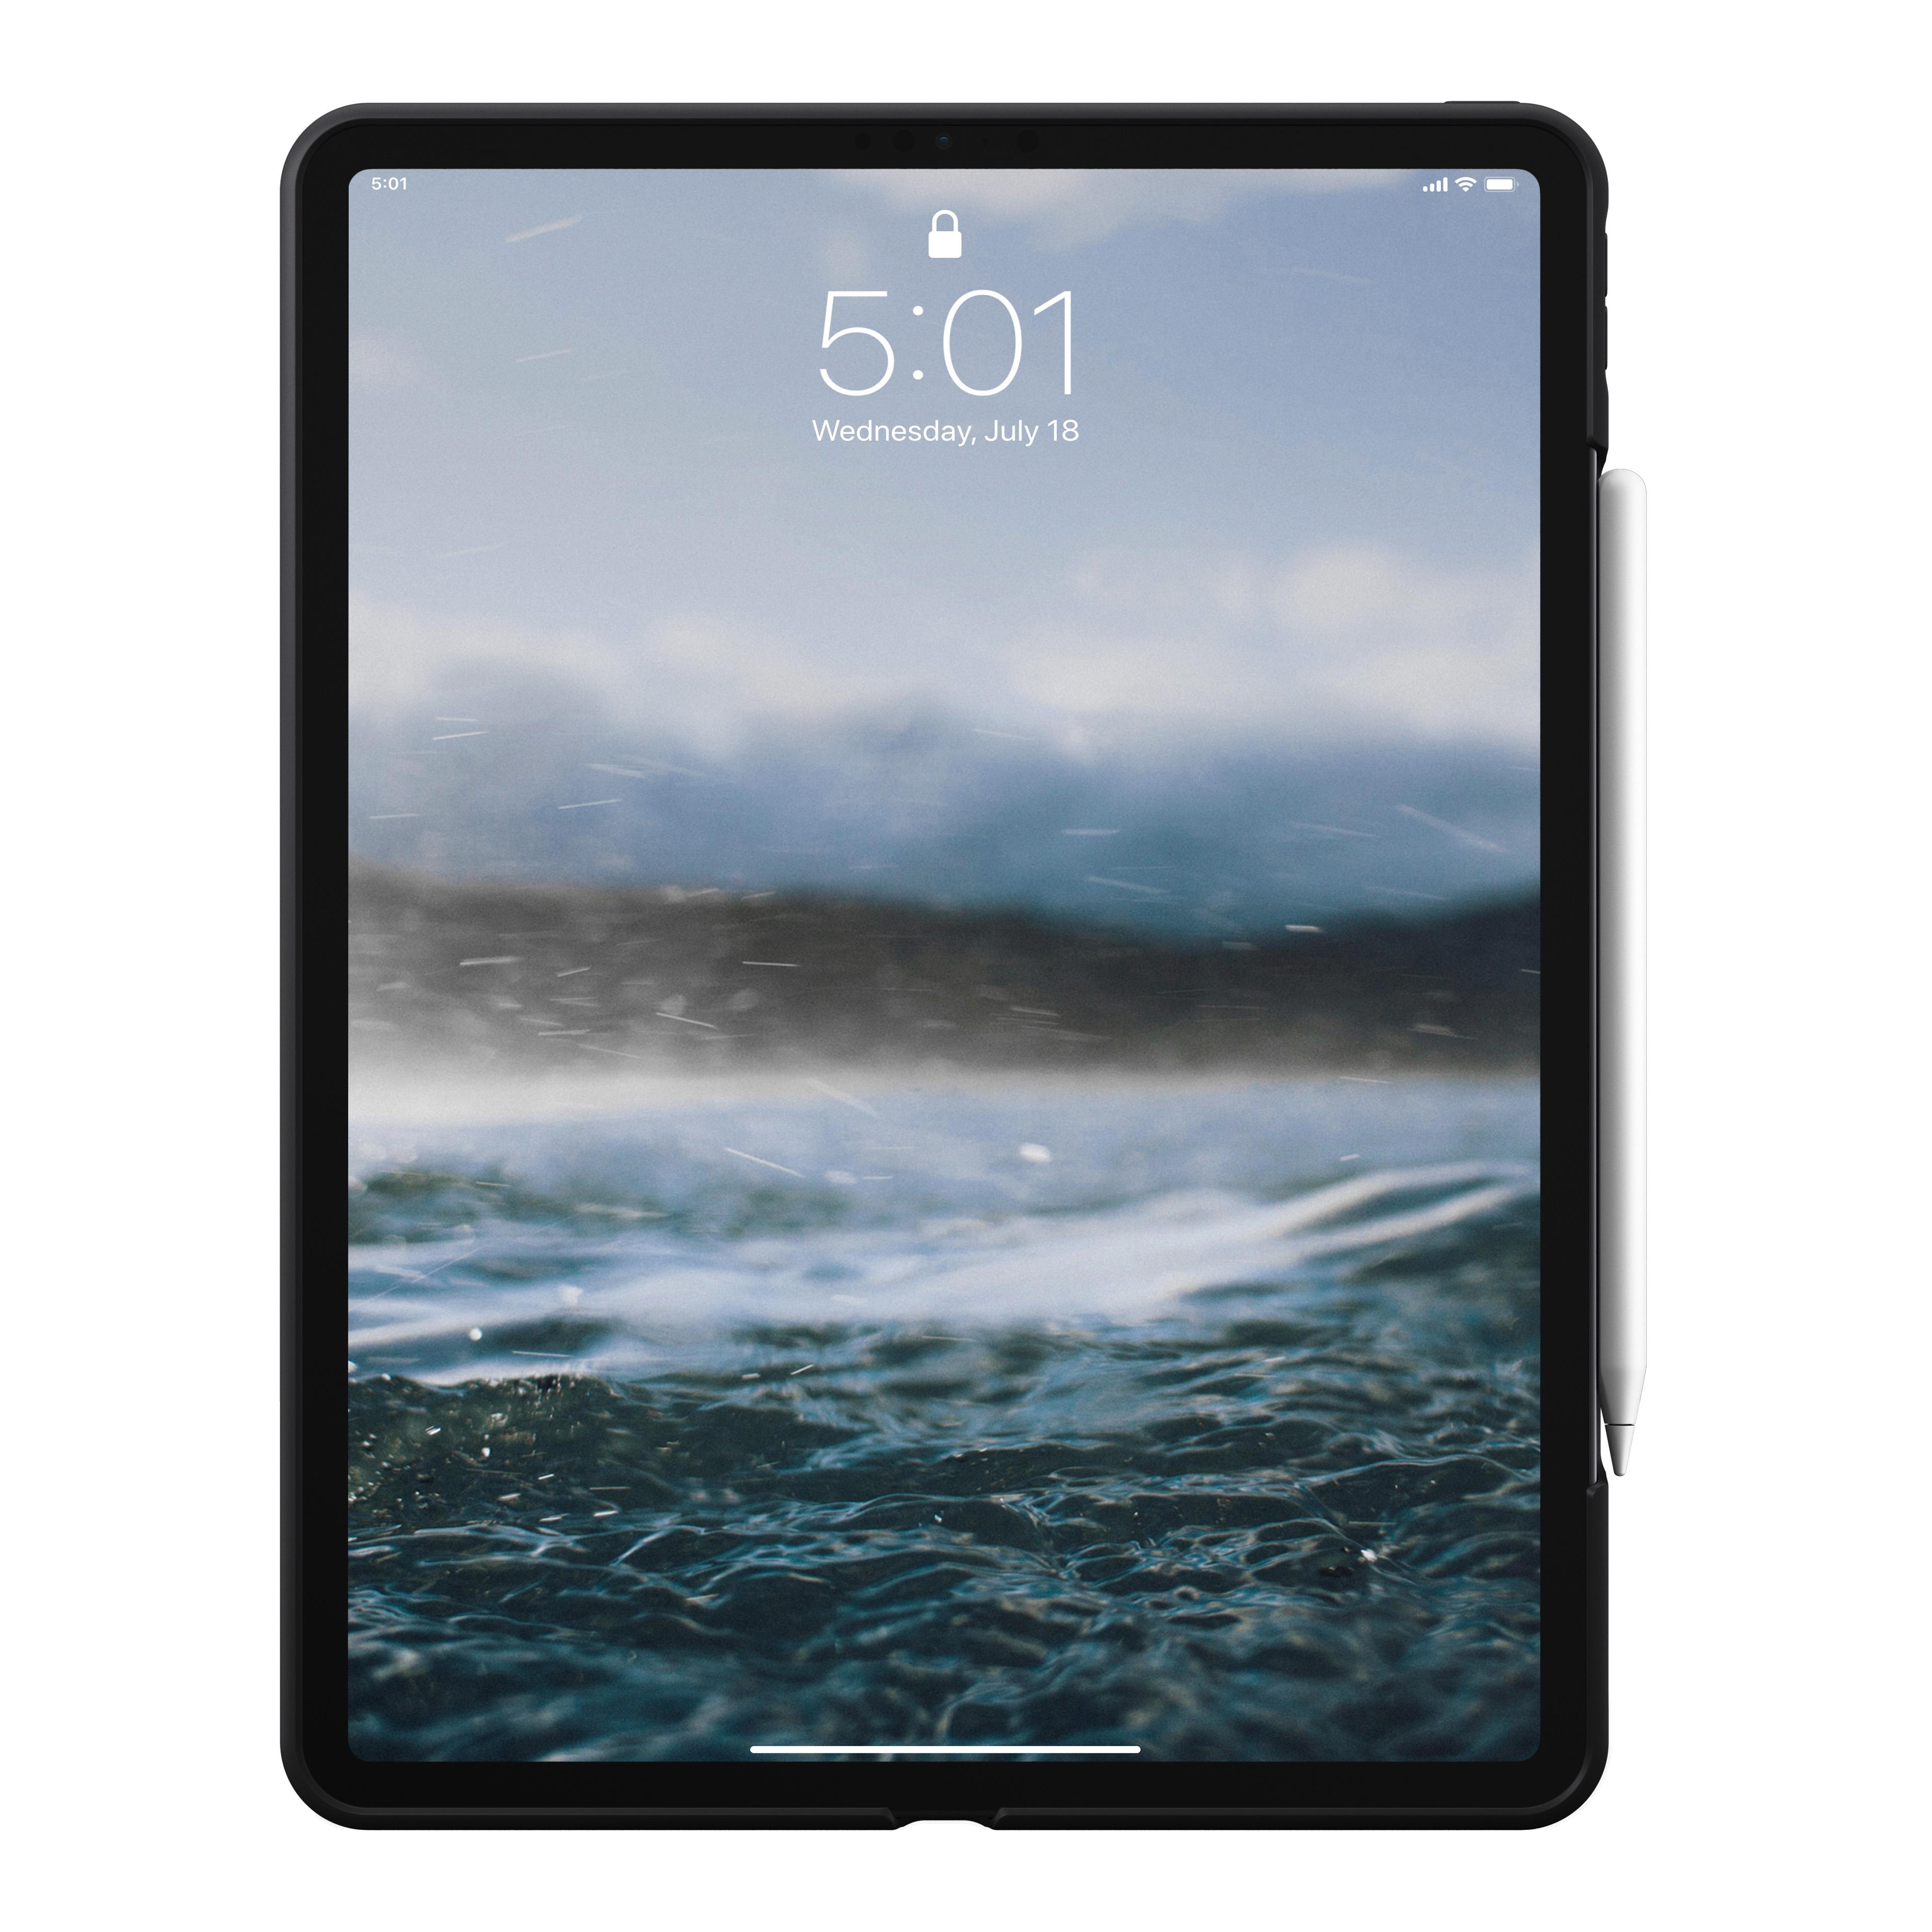 "Nomad Rugged Case Gray PU - iPad Pro 12.9"" 2018/20"